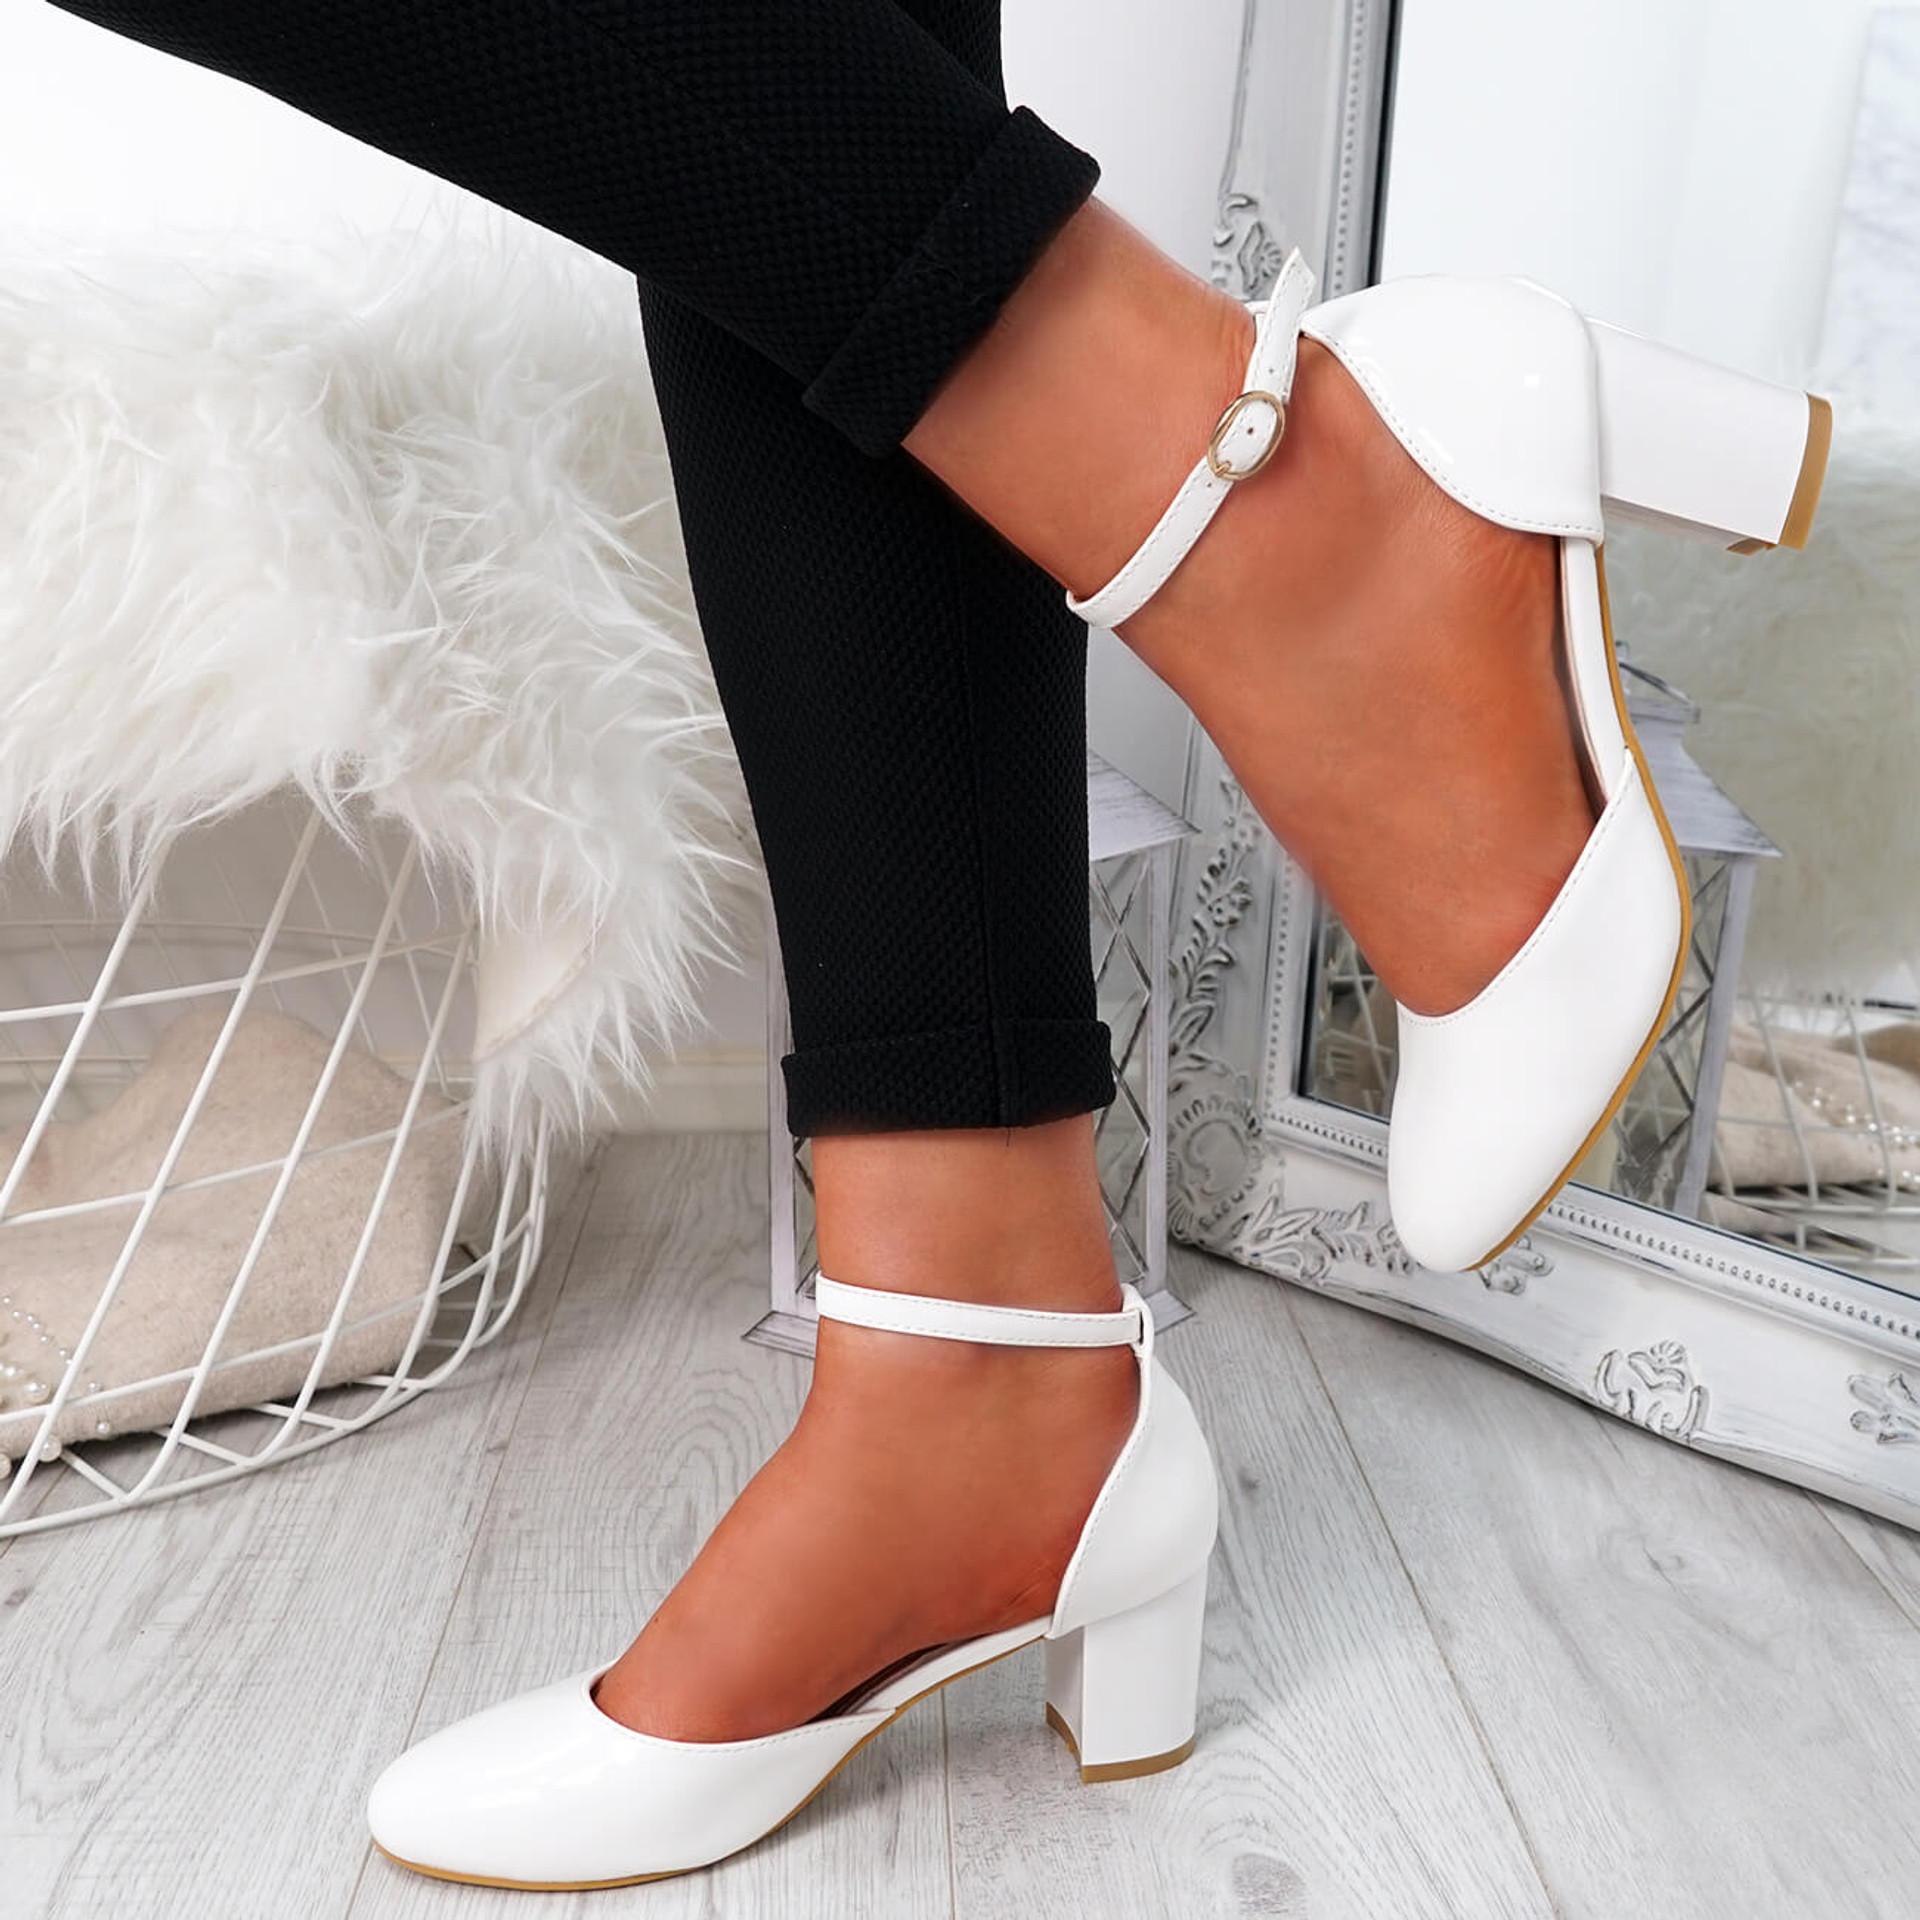 Menda White Ankle Strap Pumps